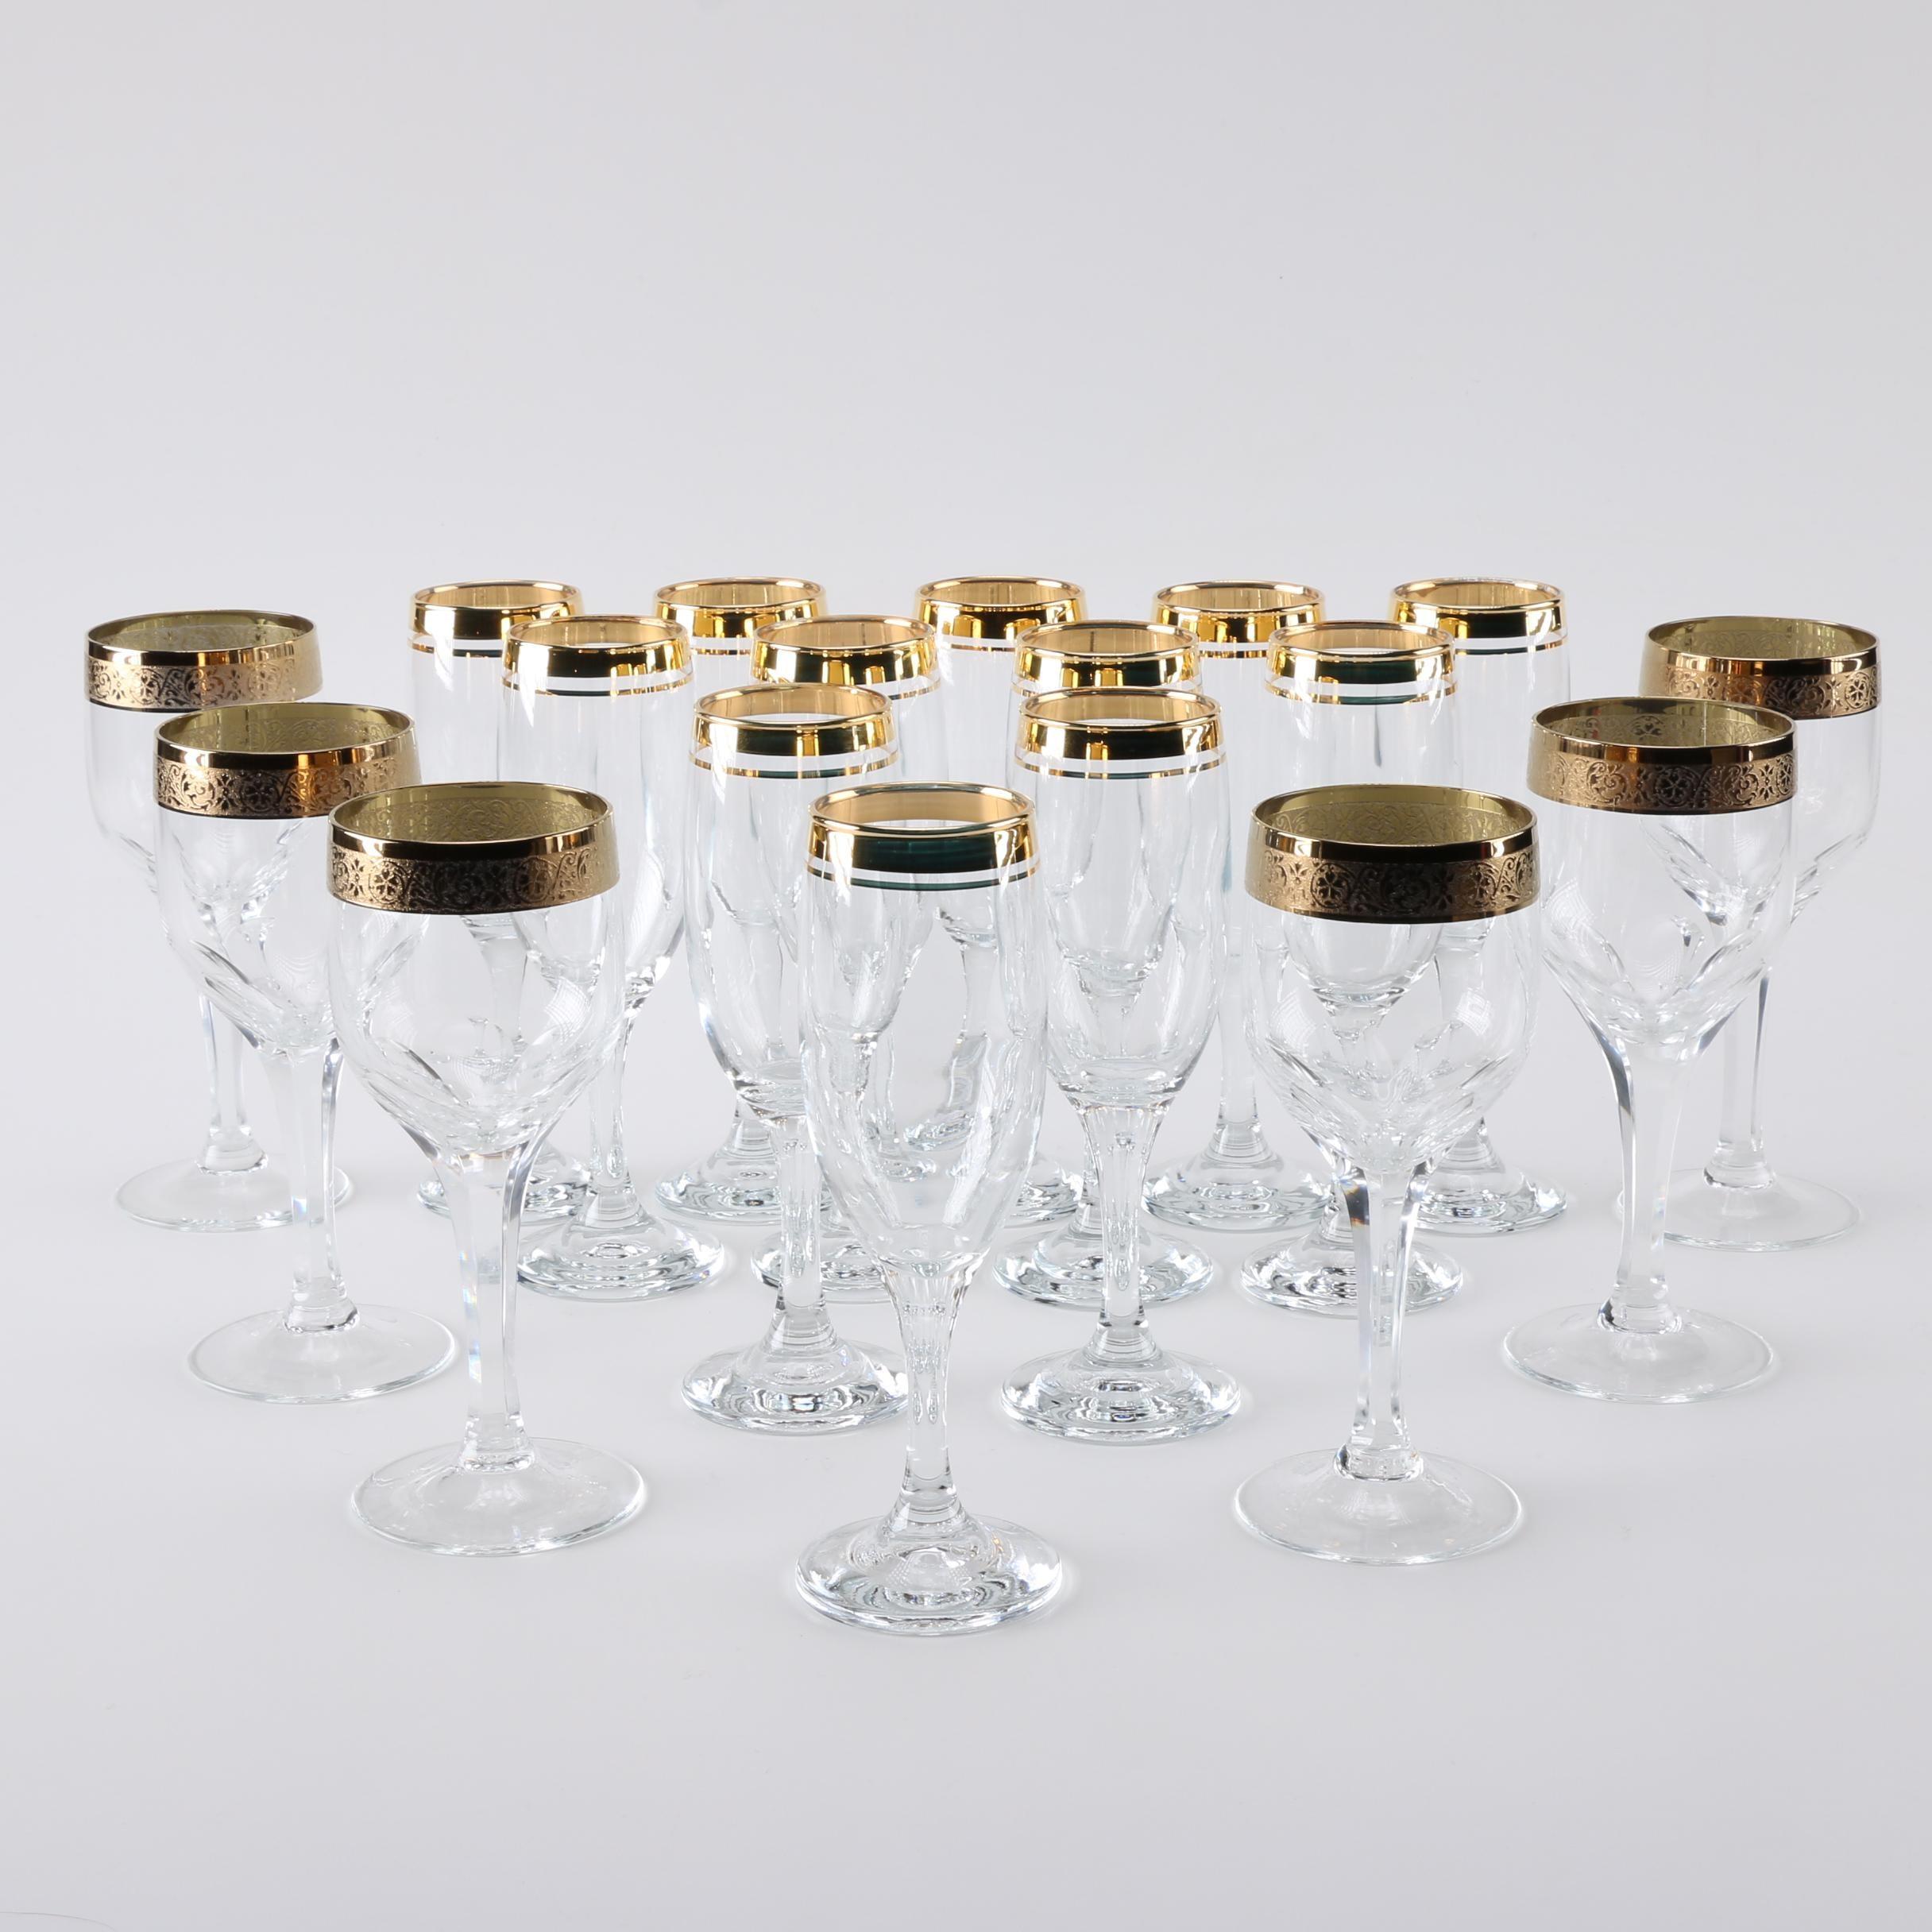 Gold Tone Trimmed Crystal Stemware